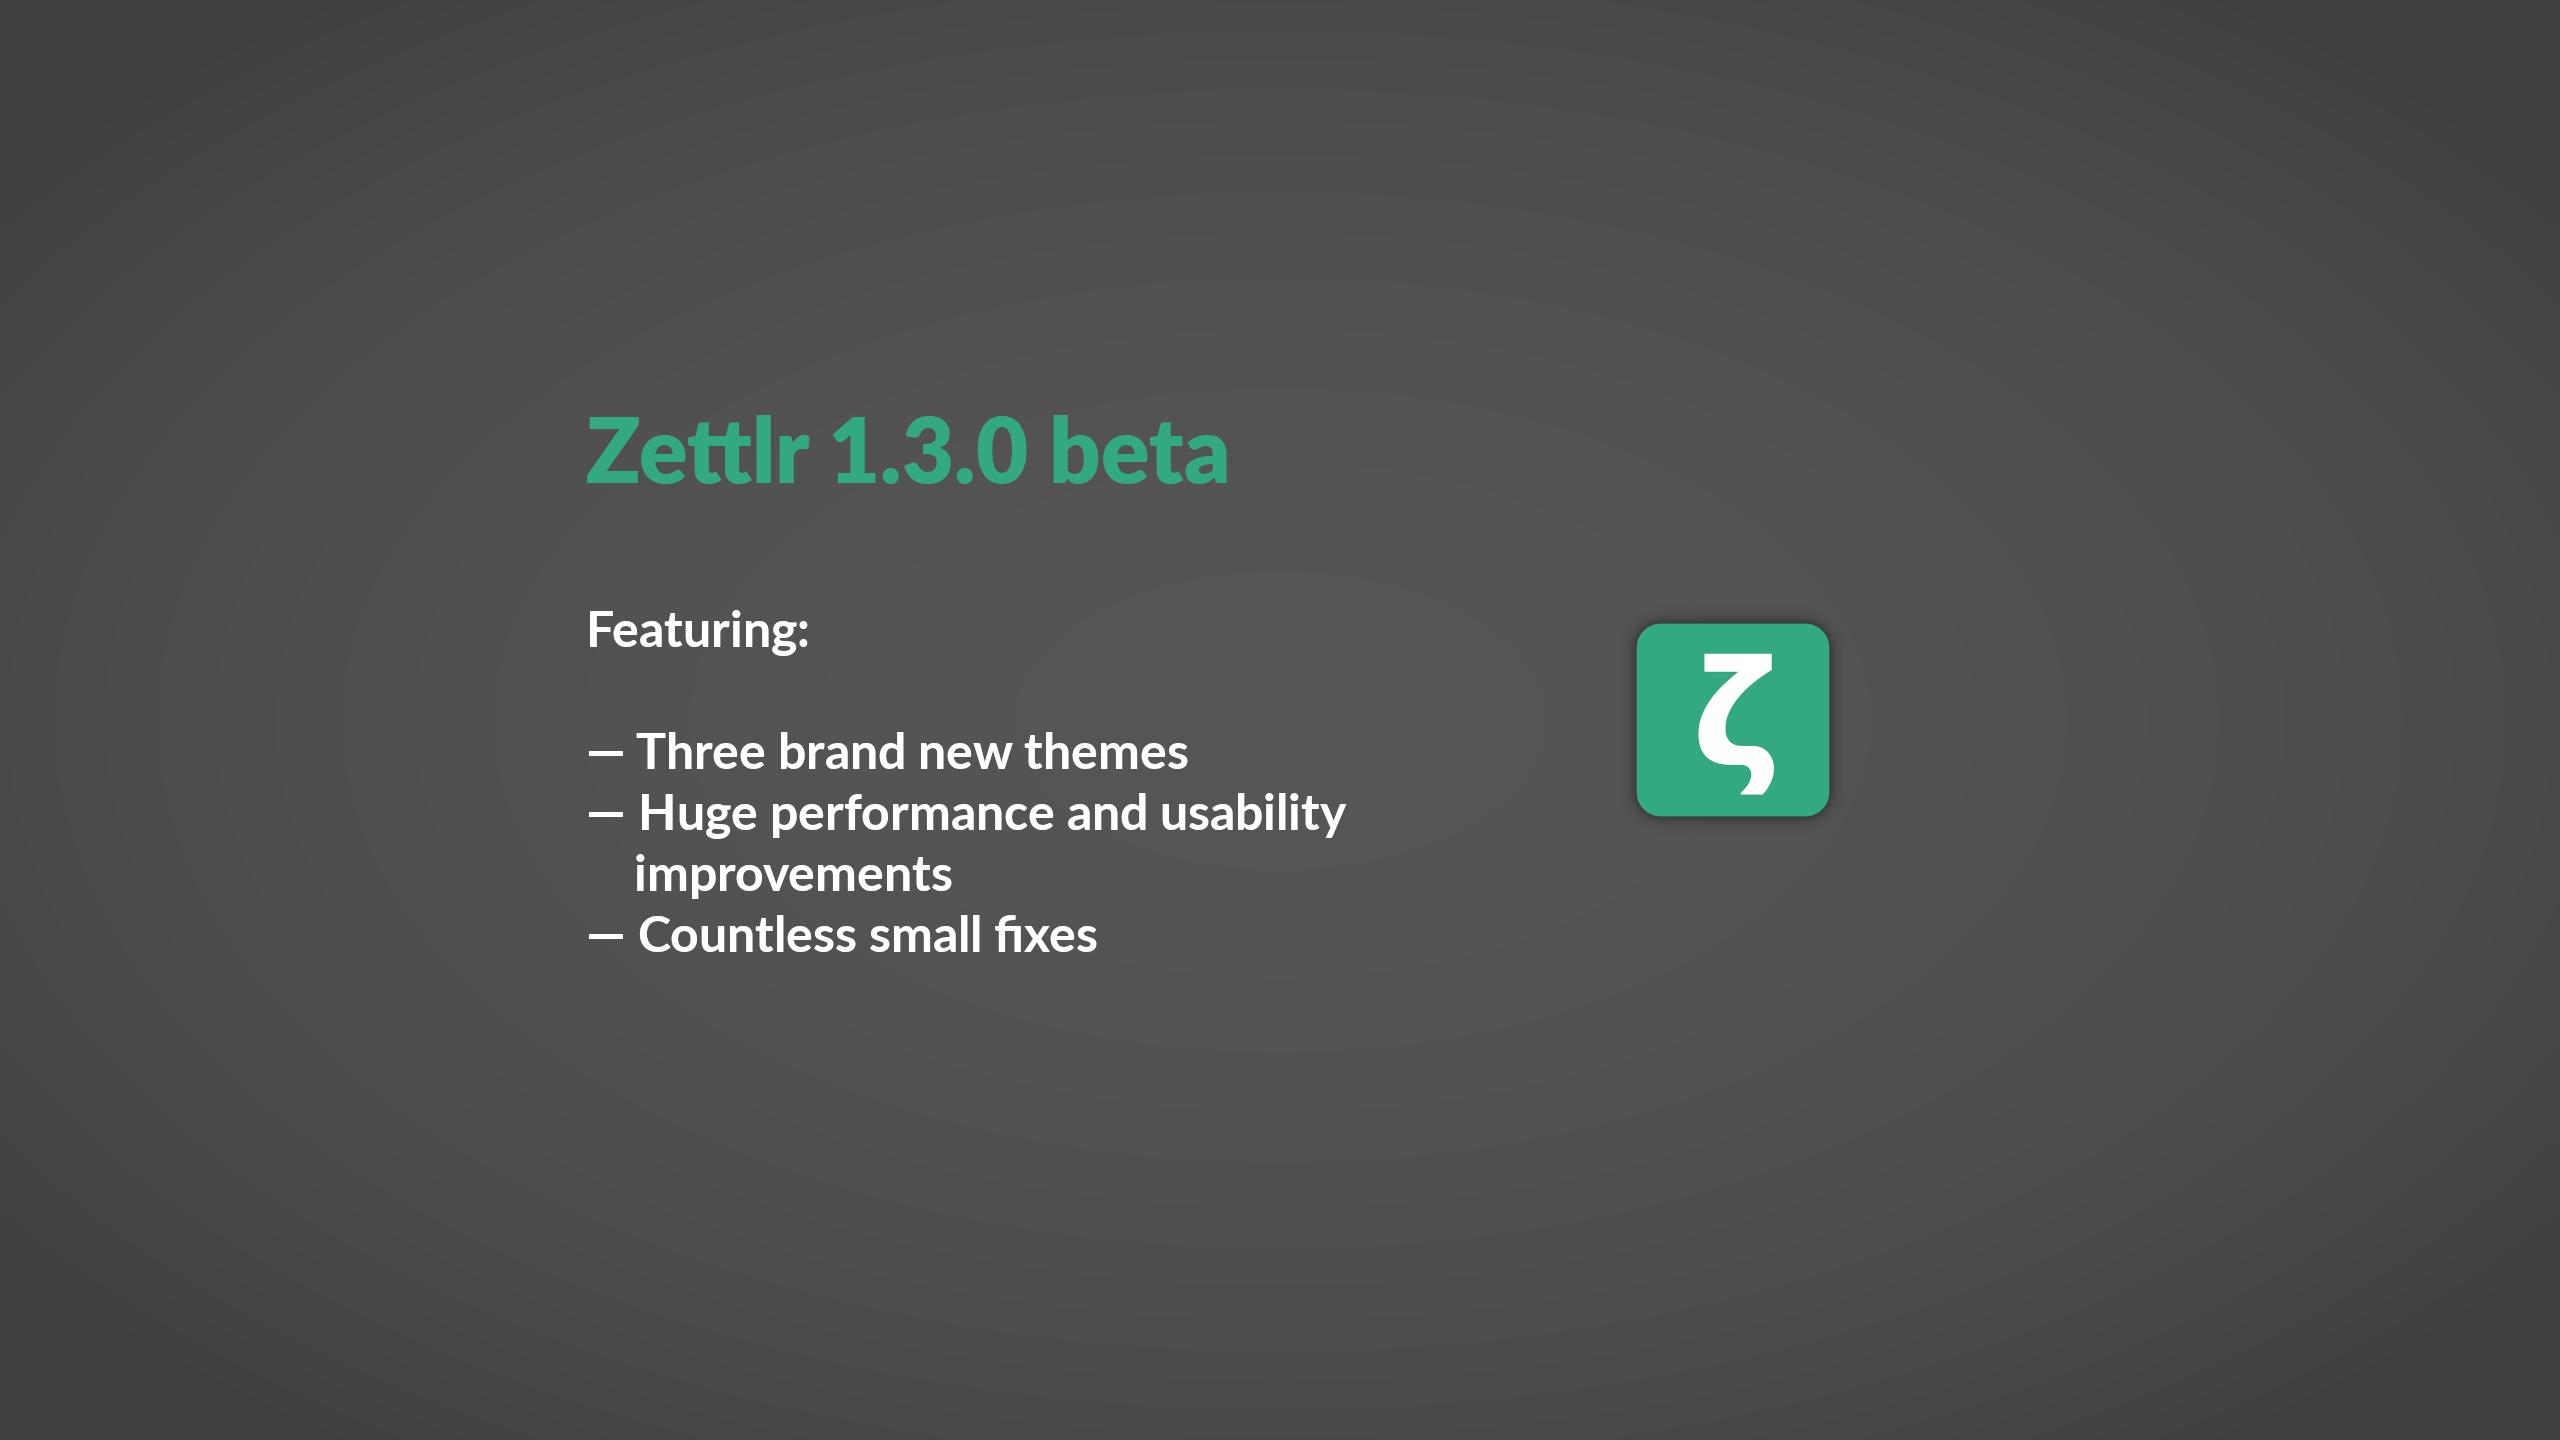 Beta Phase for Zettlr 1.3 begins